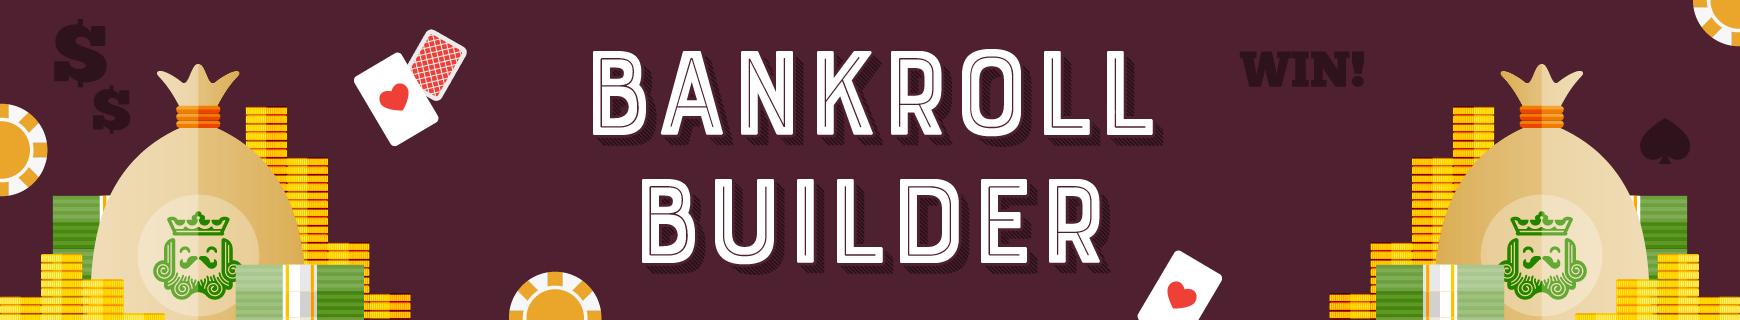 Bankroll builder %28870 x 160%29 2x